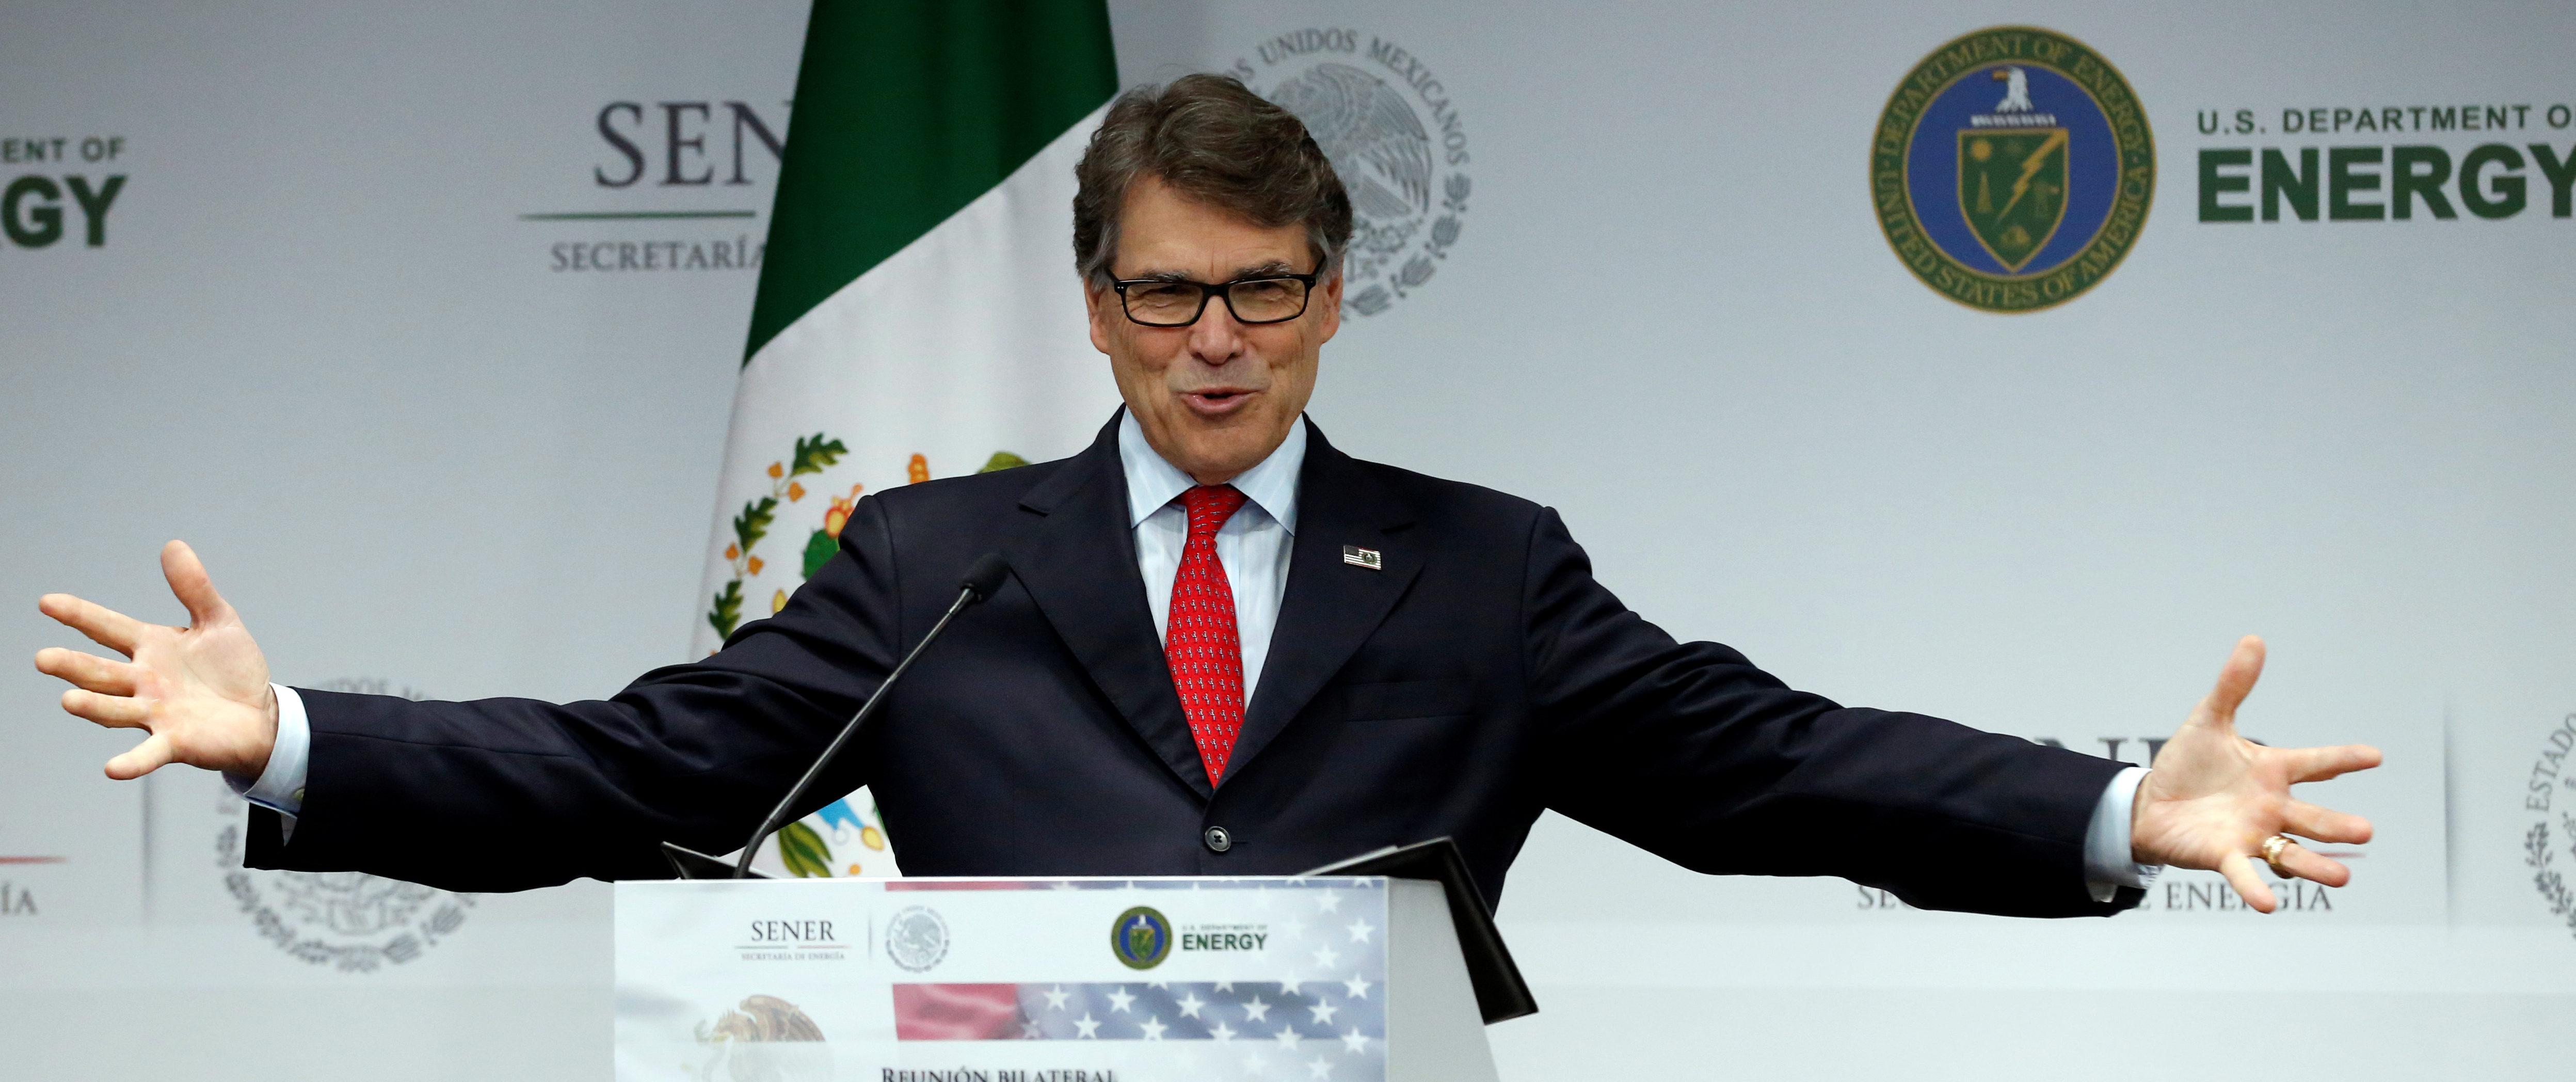 U.S. Energy Secretary Rick Perry addresses the media in Mexico City